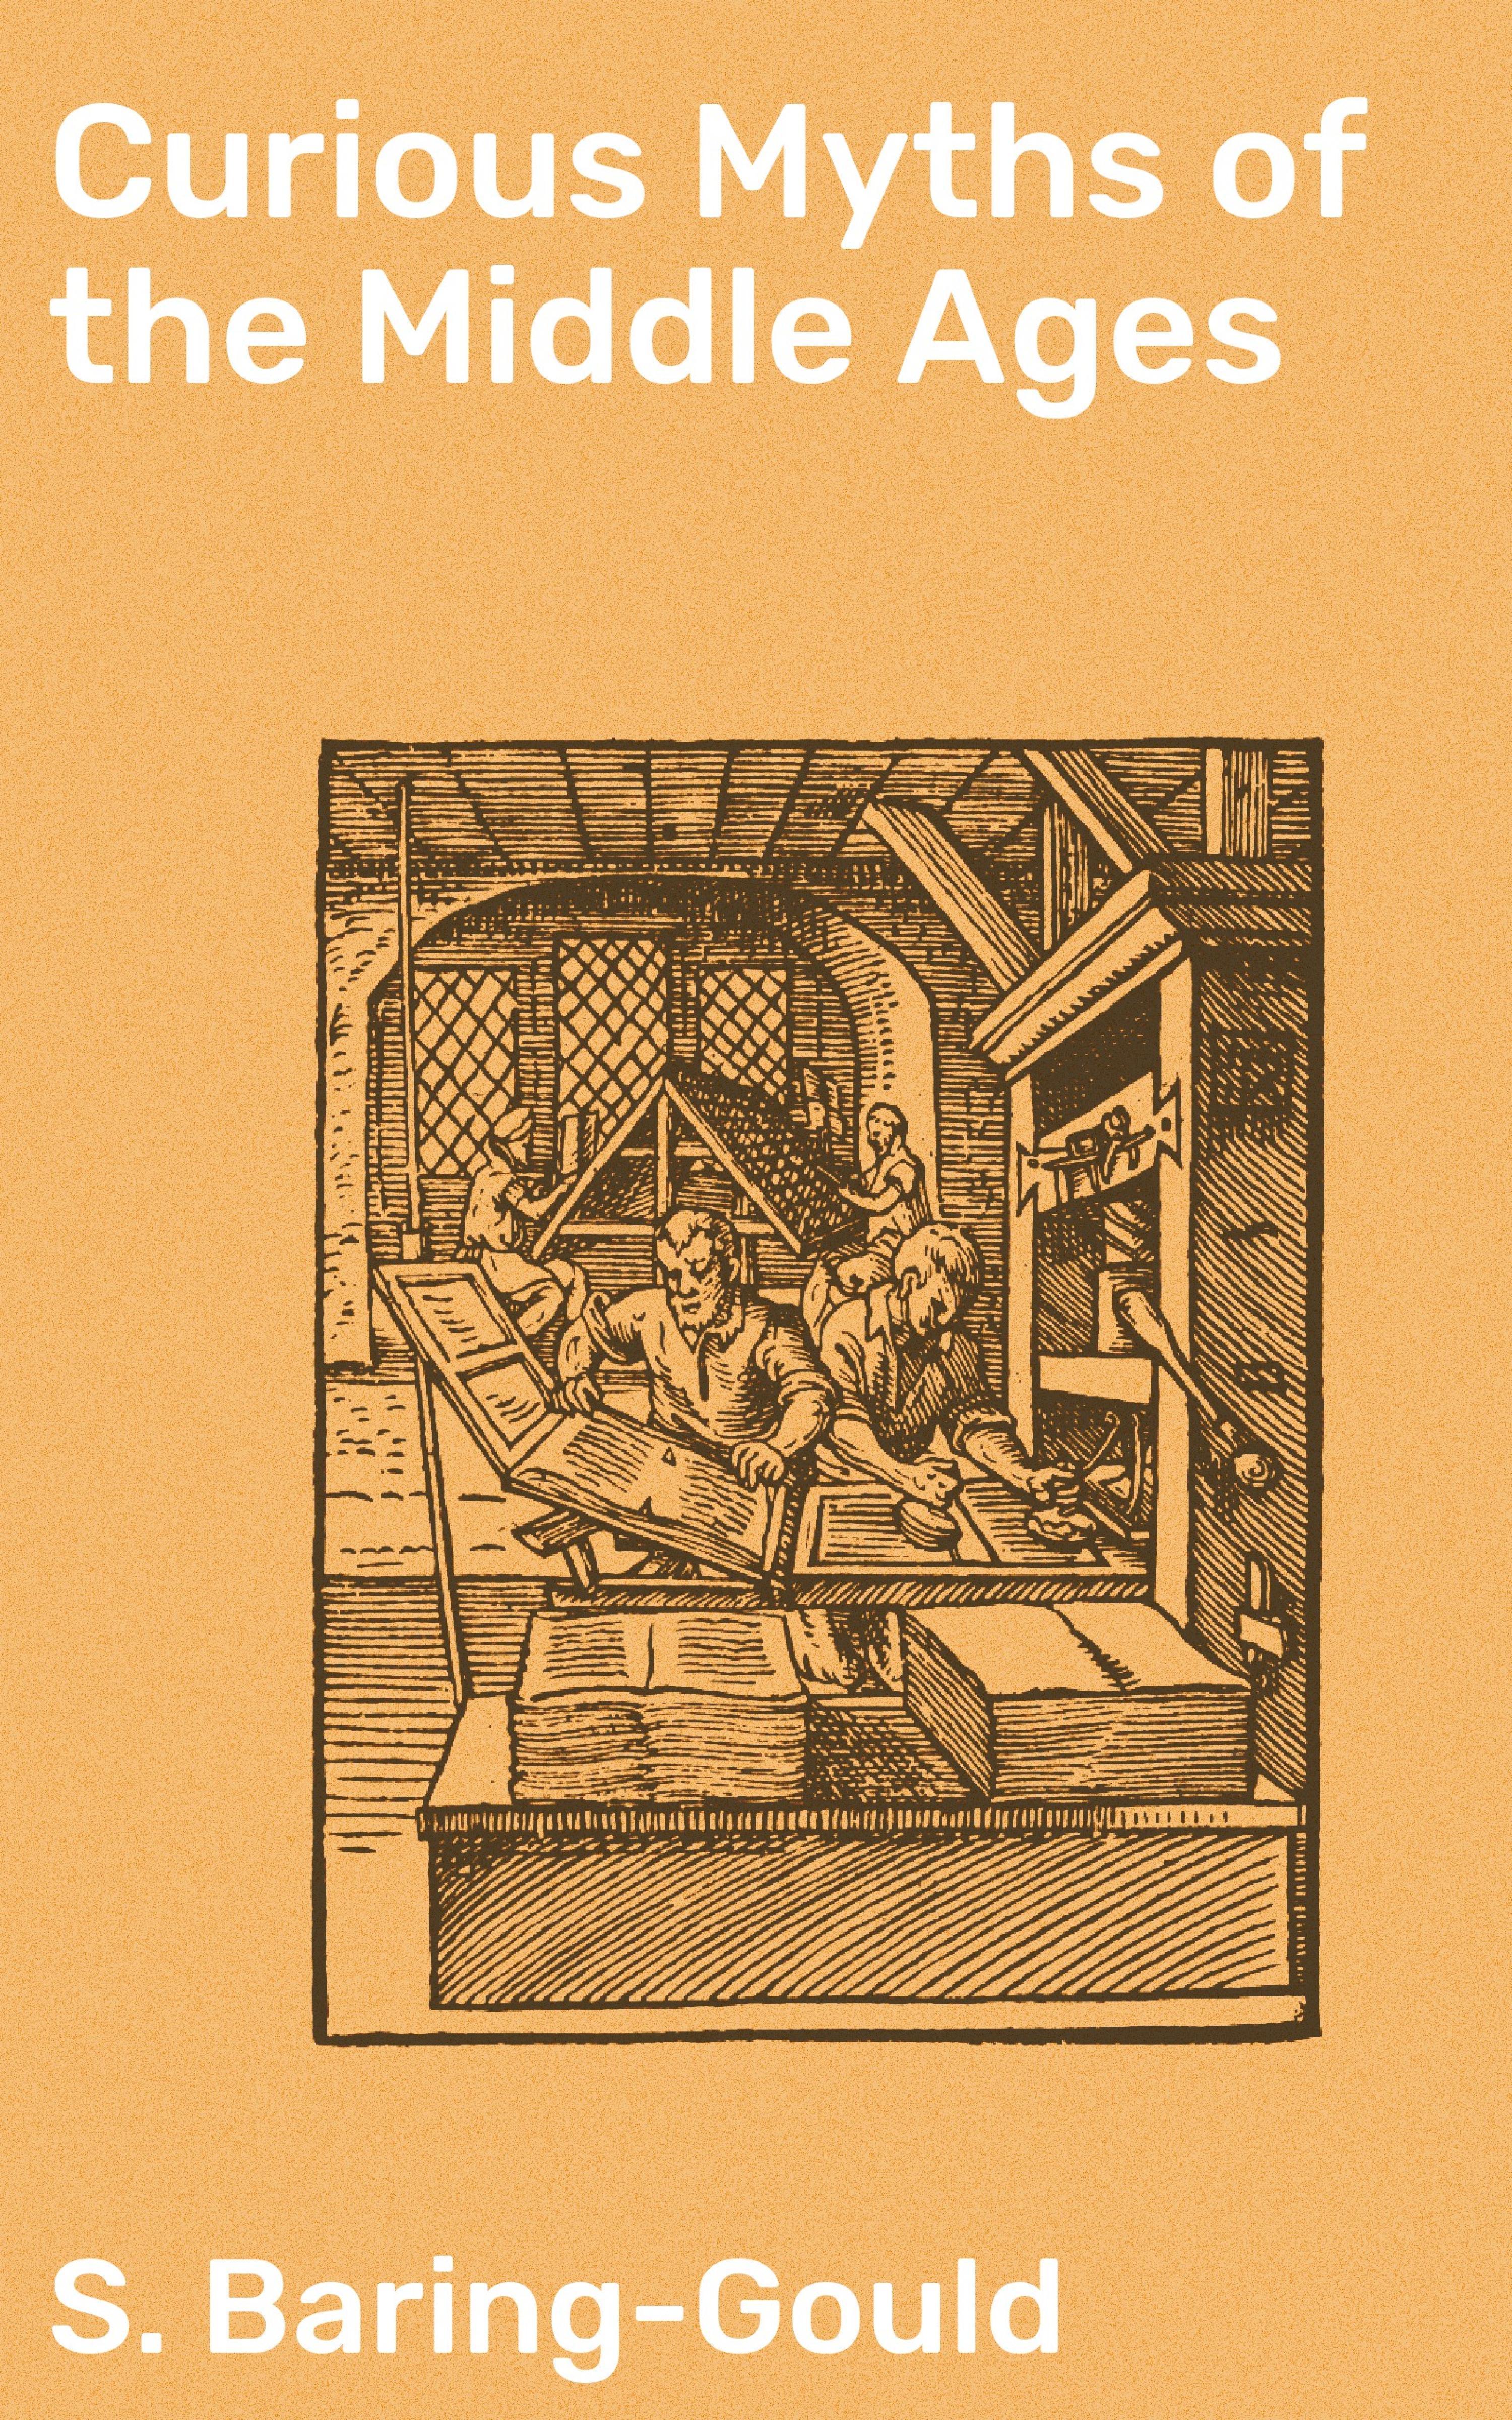 цена S. (Sabine) Baring-Gould Curious Myths of the Middle Ages онлайн в 2017 году